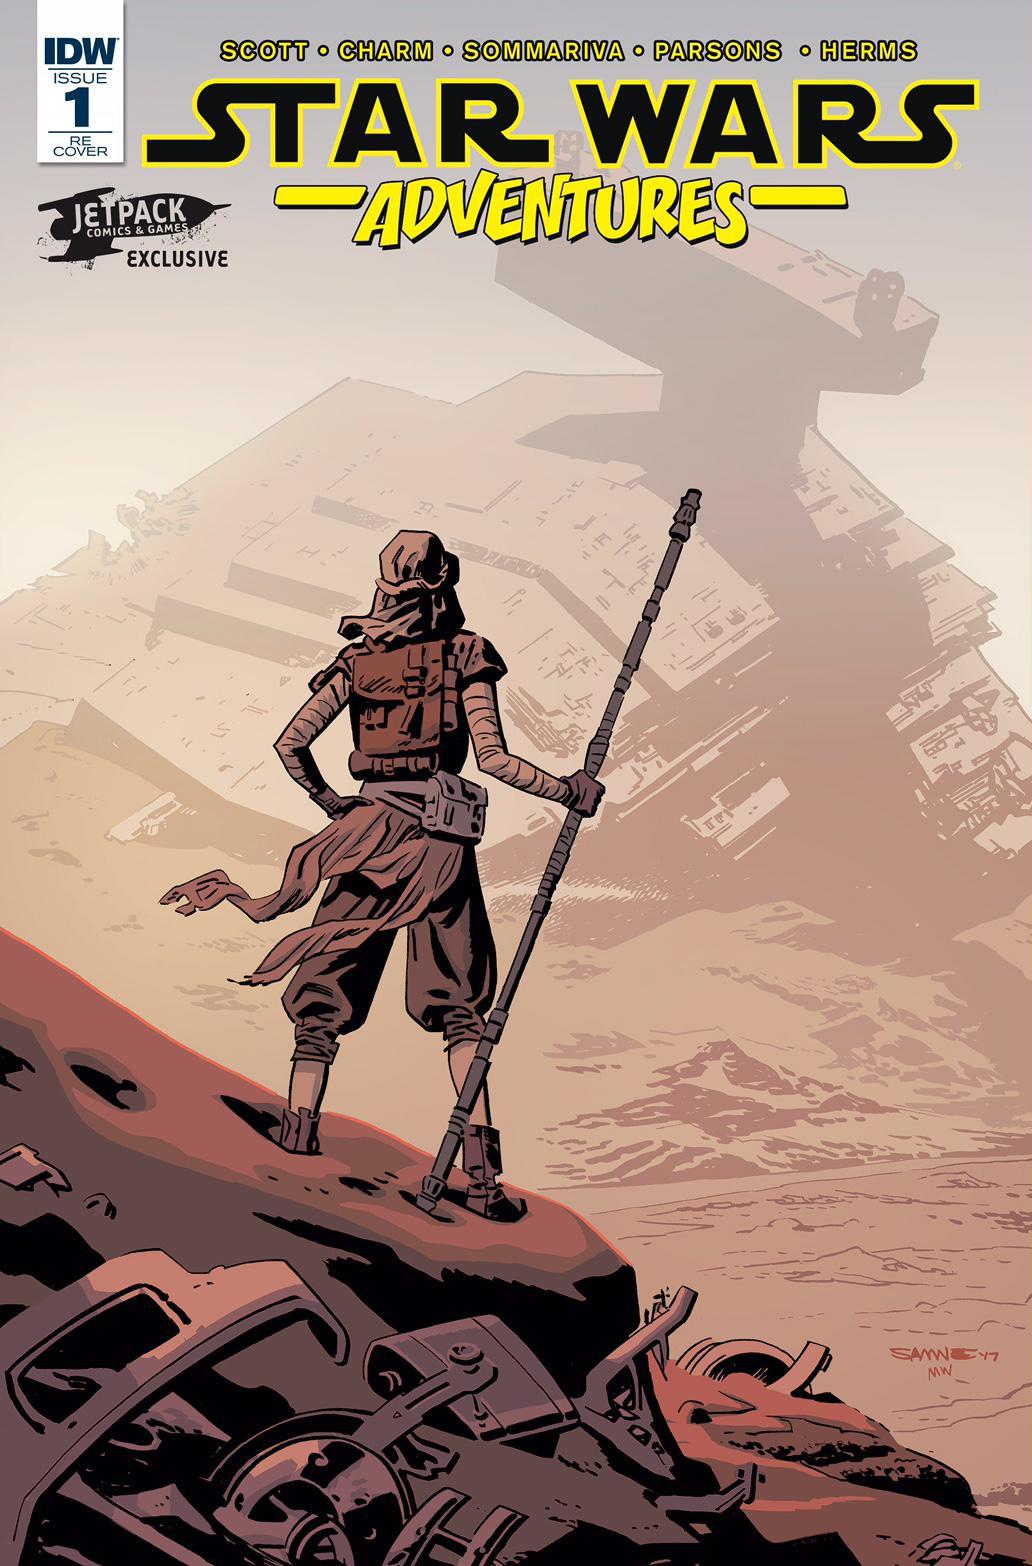 Star Wars Adventures #1 (Chris Samnee Jetpack/Forbidden Planet Variant Cover) (06.09.2017)